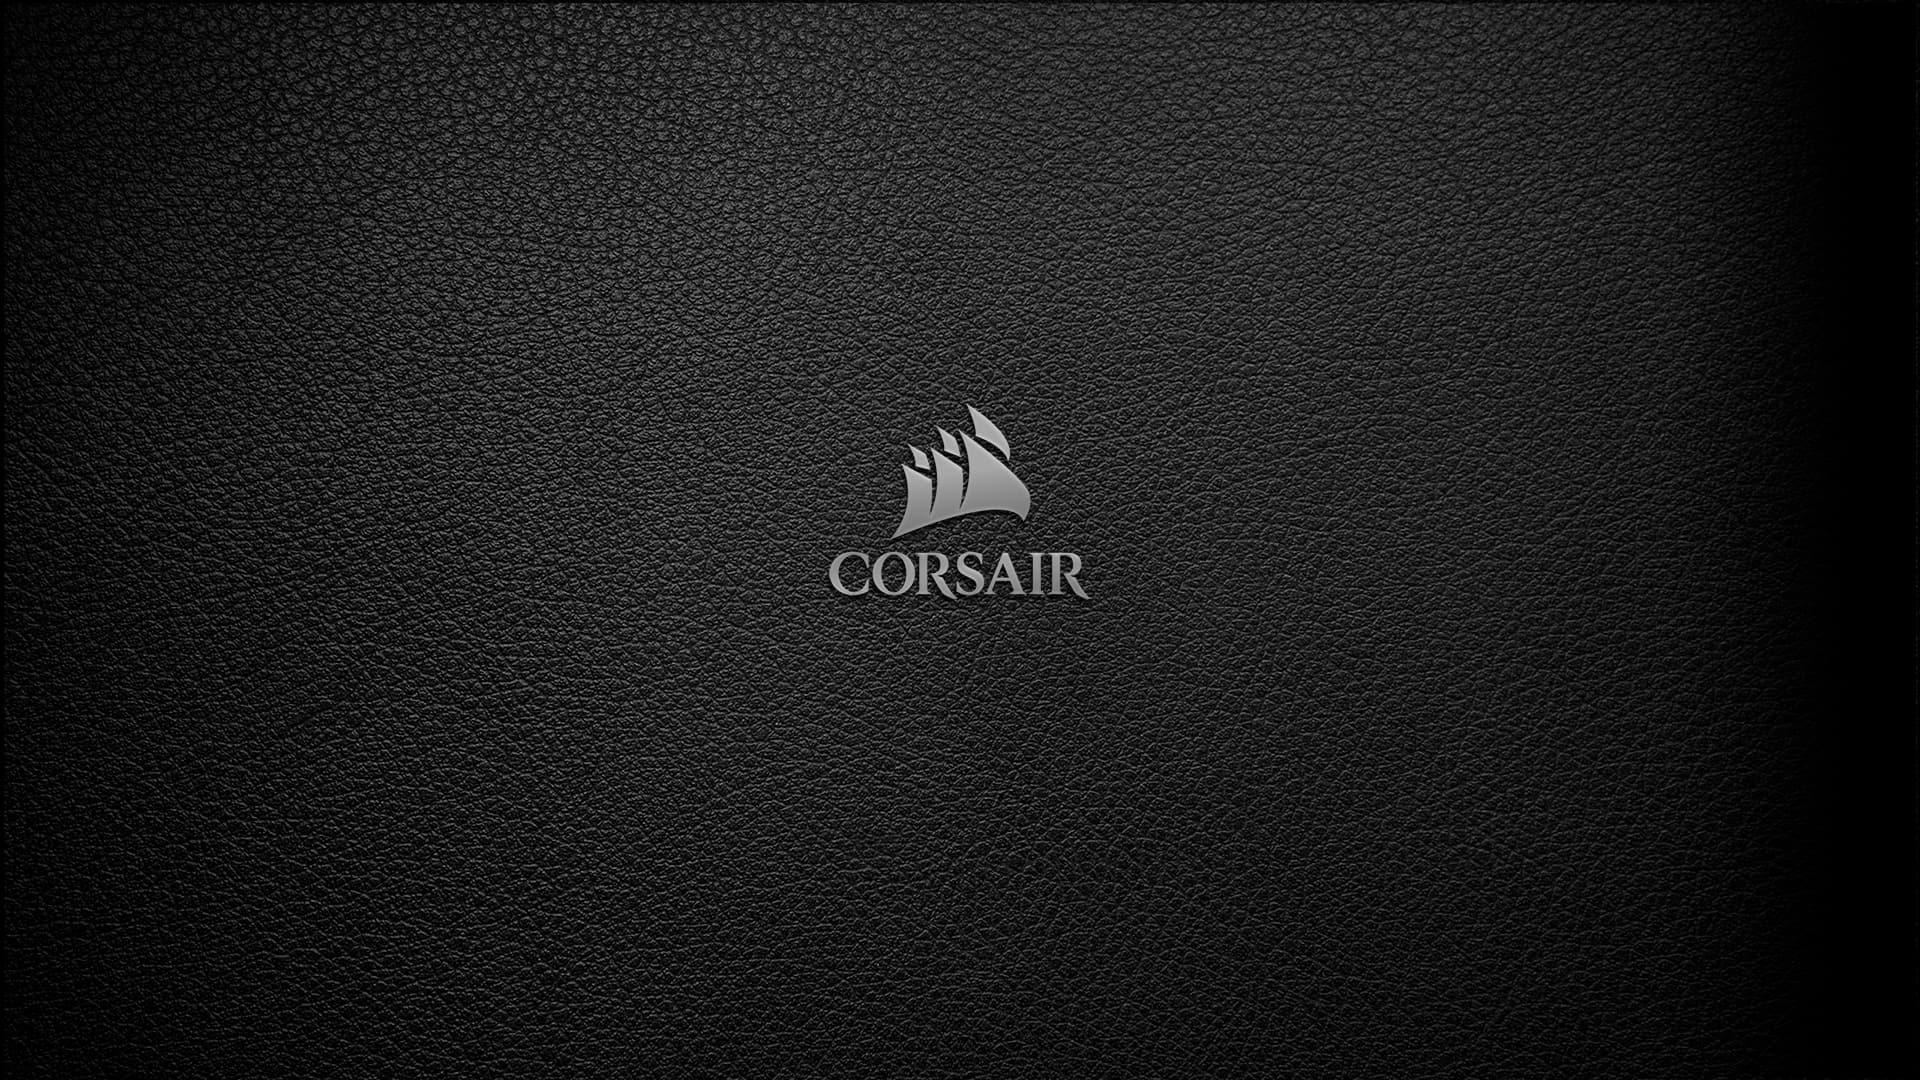 Corsair Wallpaper: White Background Wallpapers 1920x1080